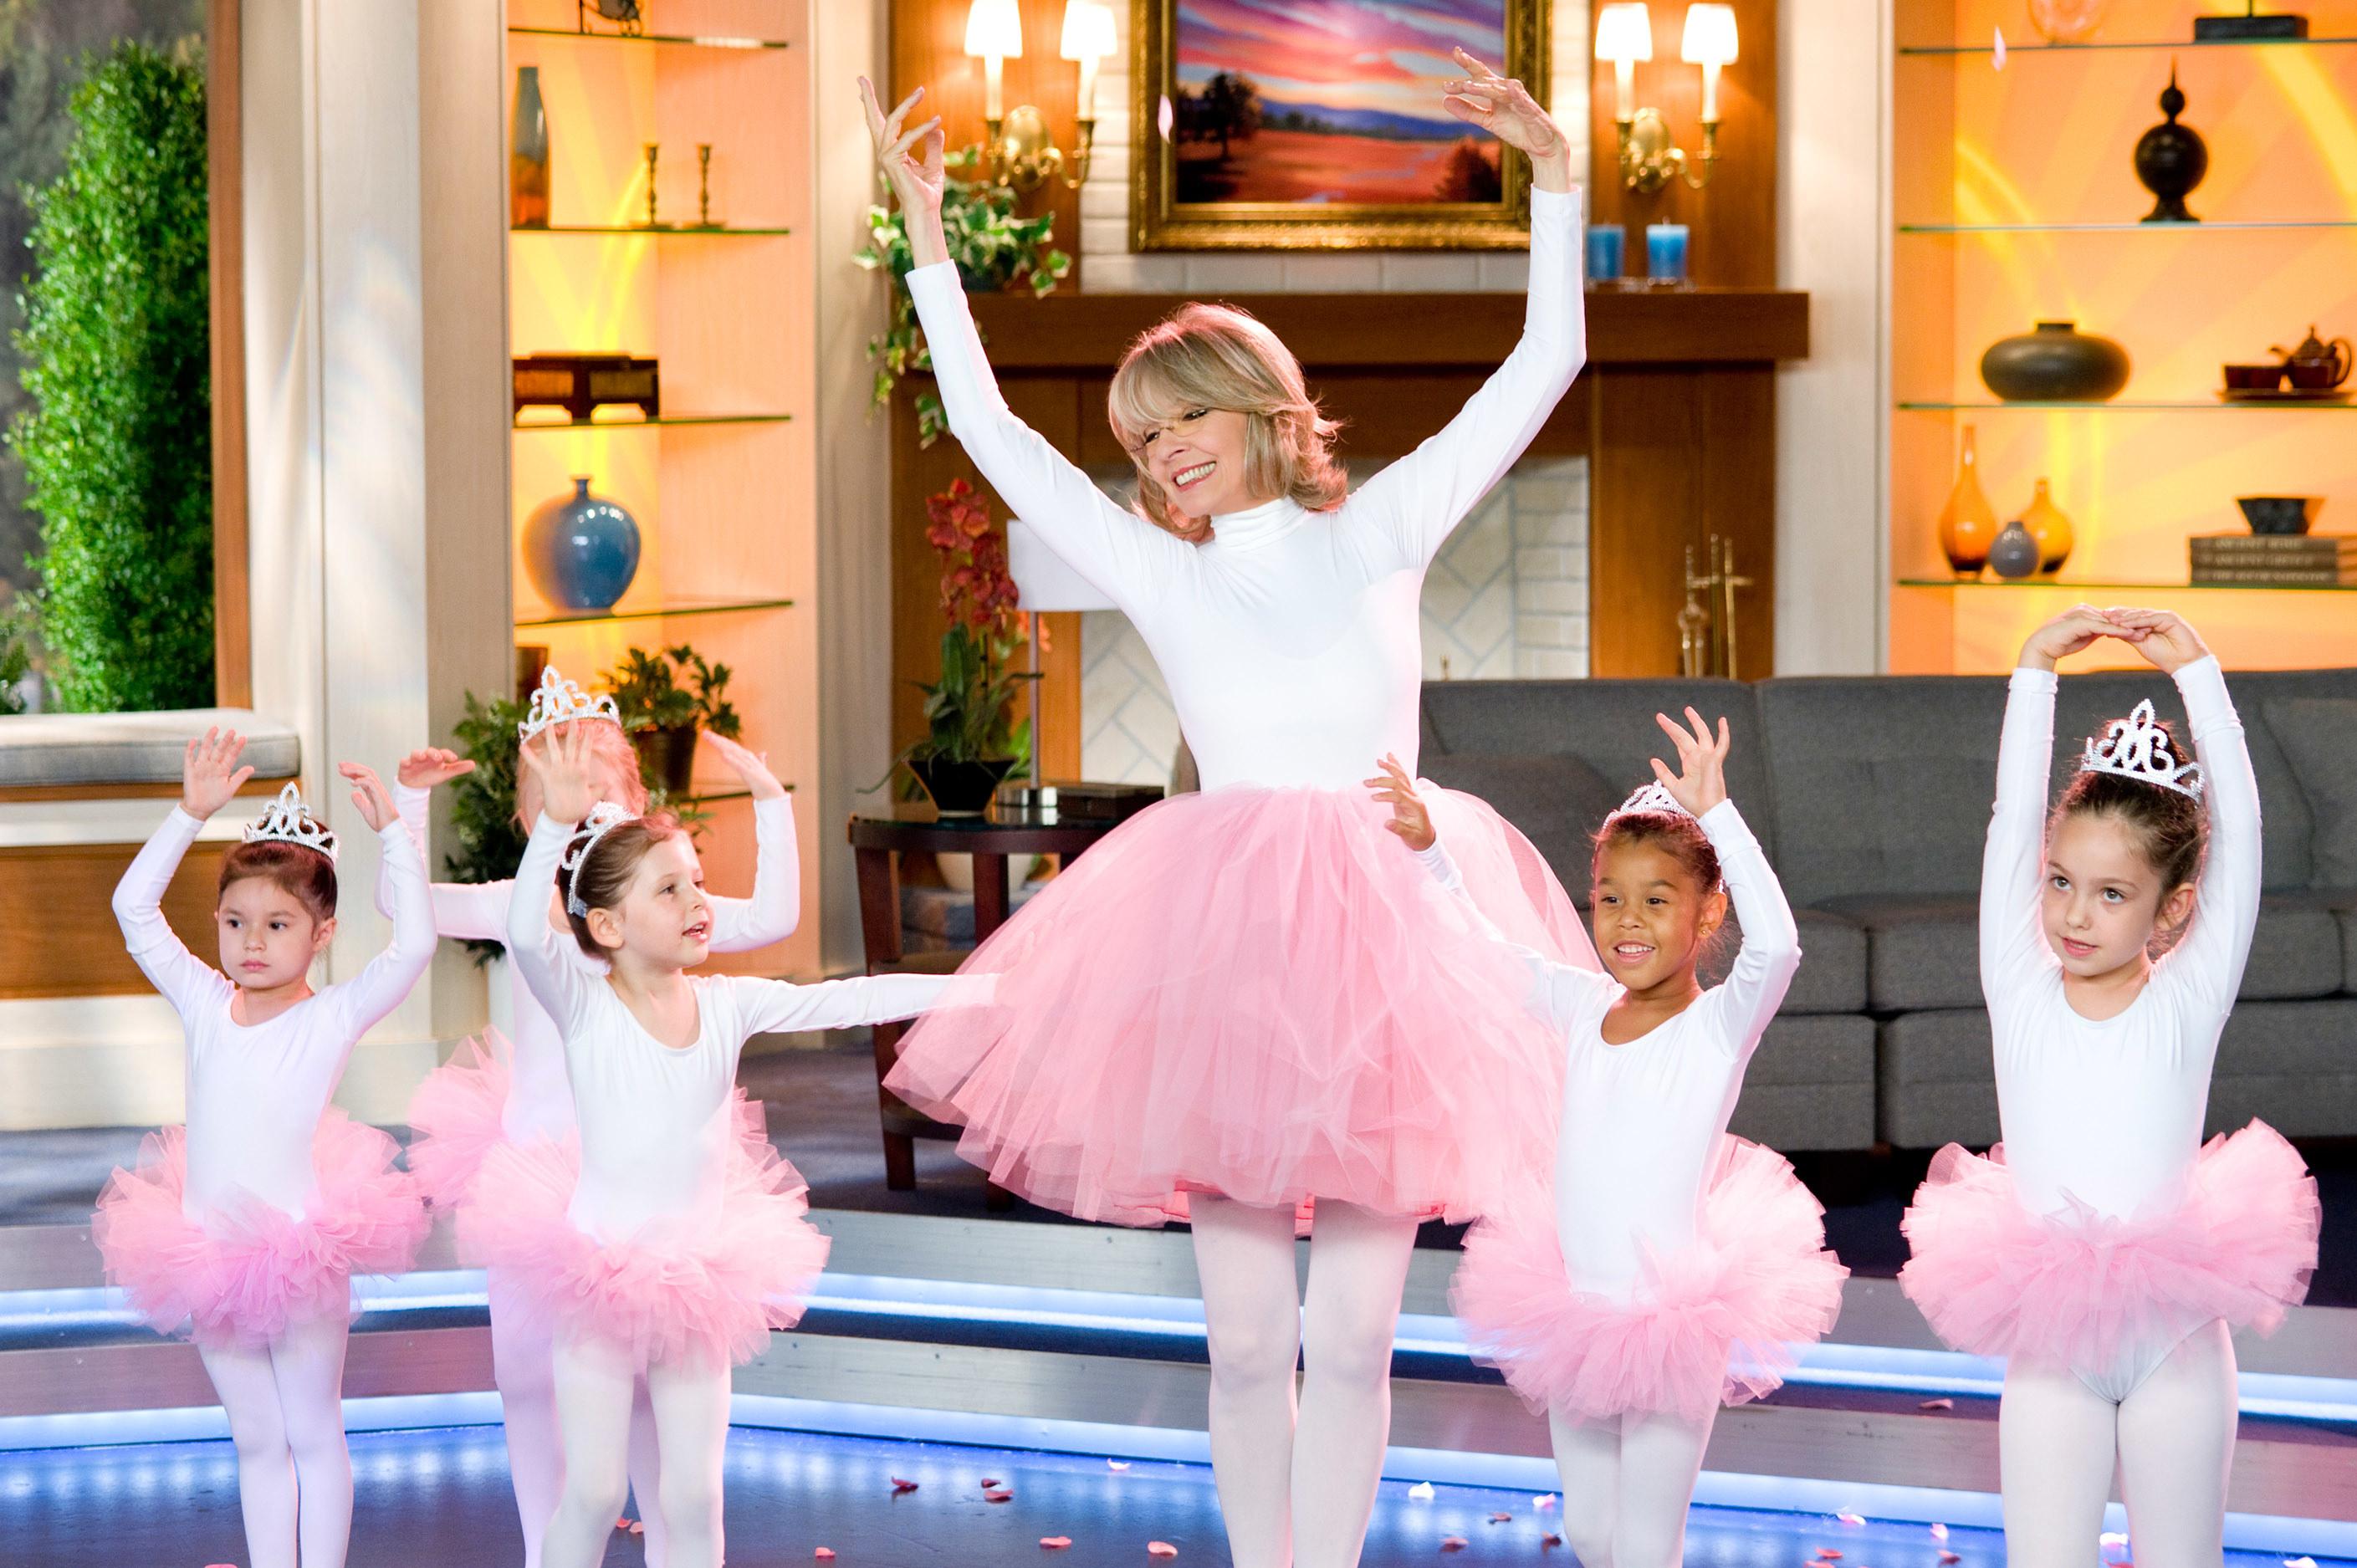 Diane Keaton dances with children ballerinas